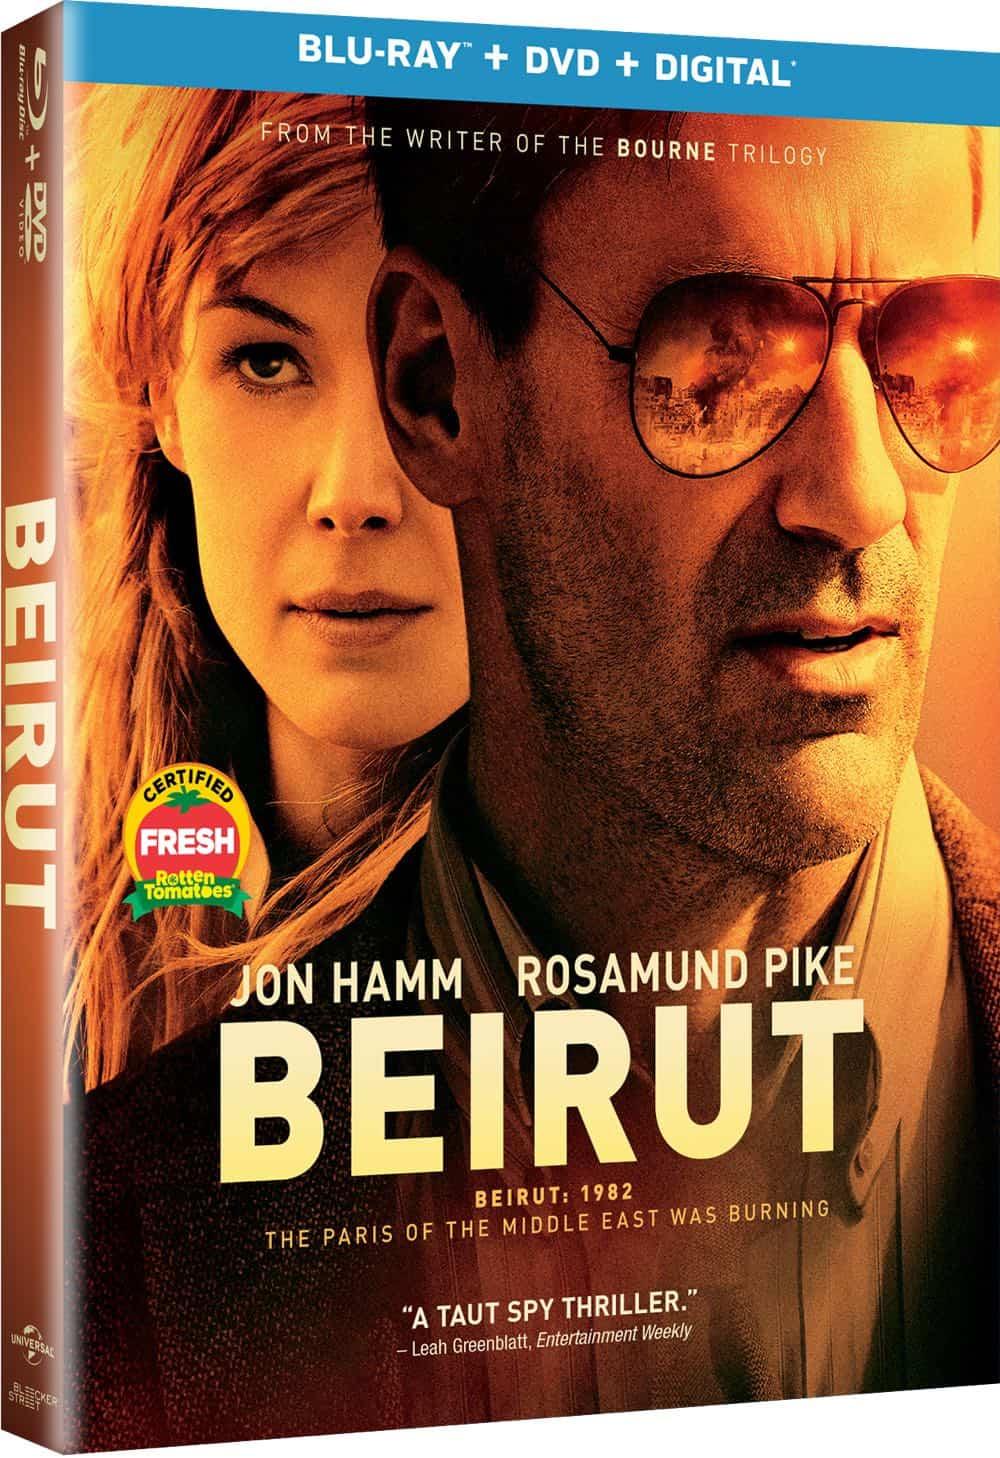 Beirut Bluray DVD Digital Cover 3